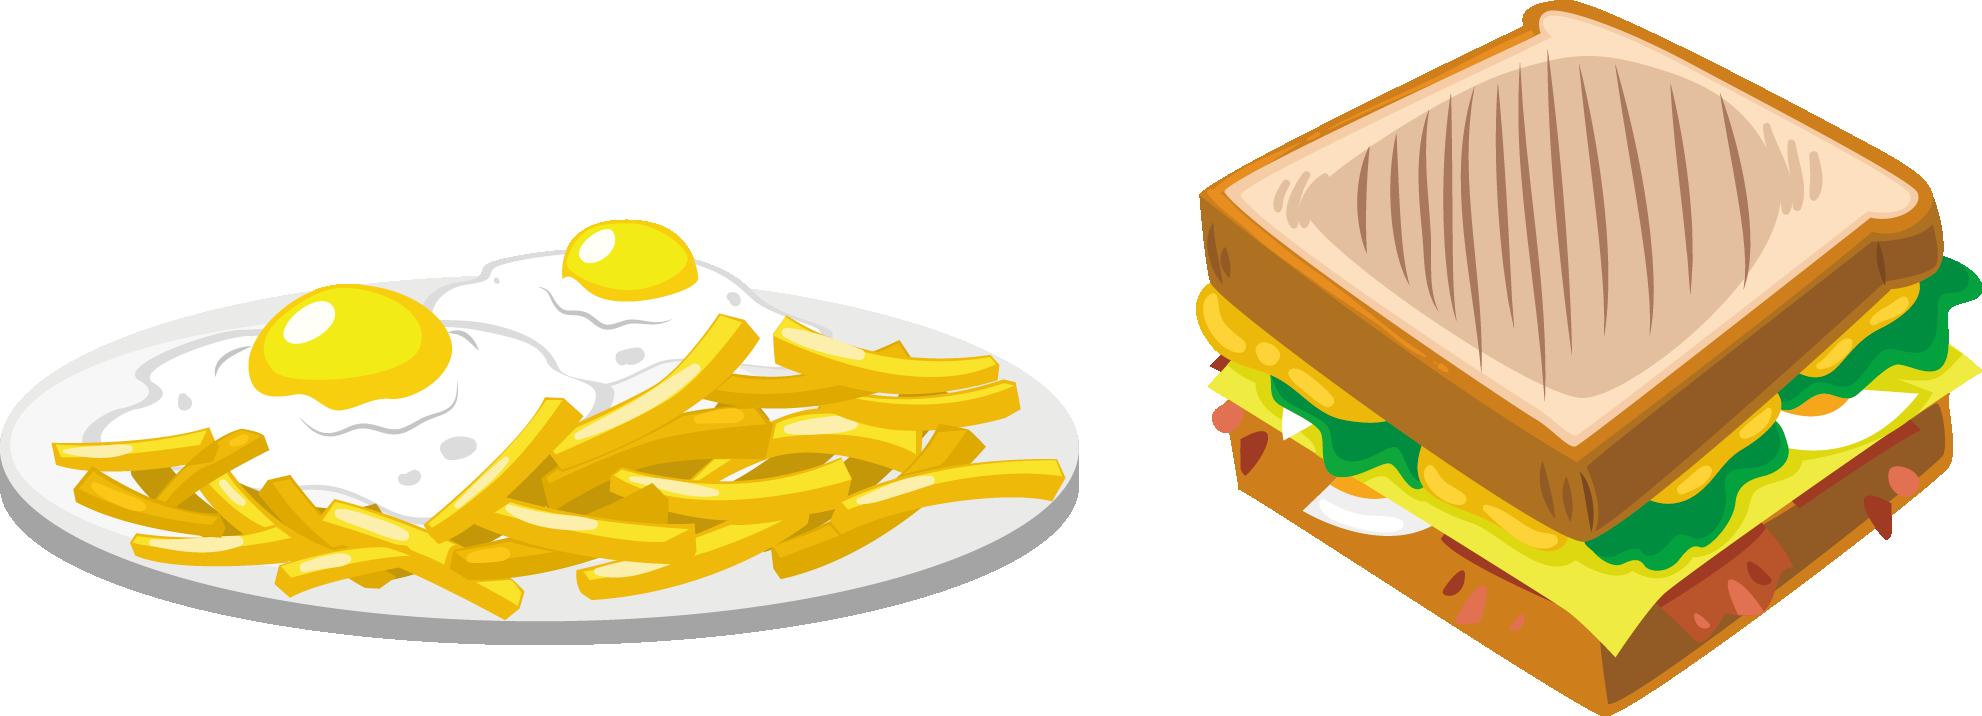 Fast food hamburger french. Fries clipart breakfast